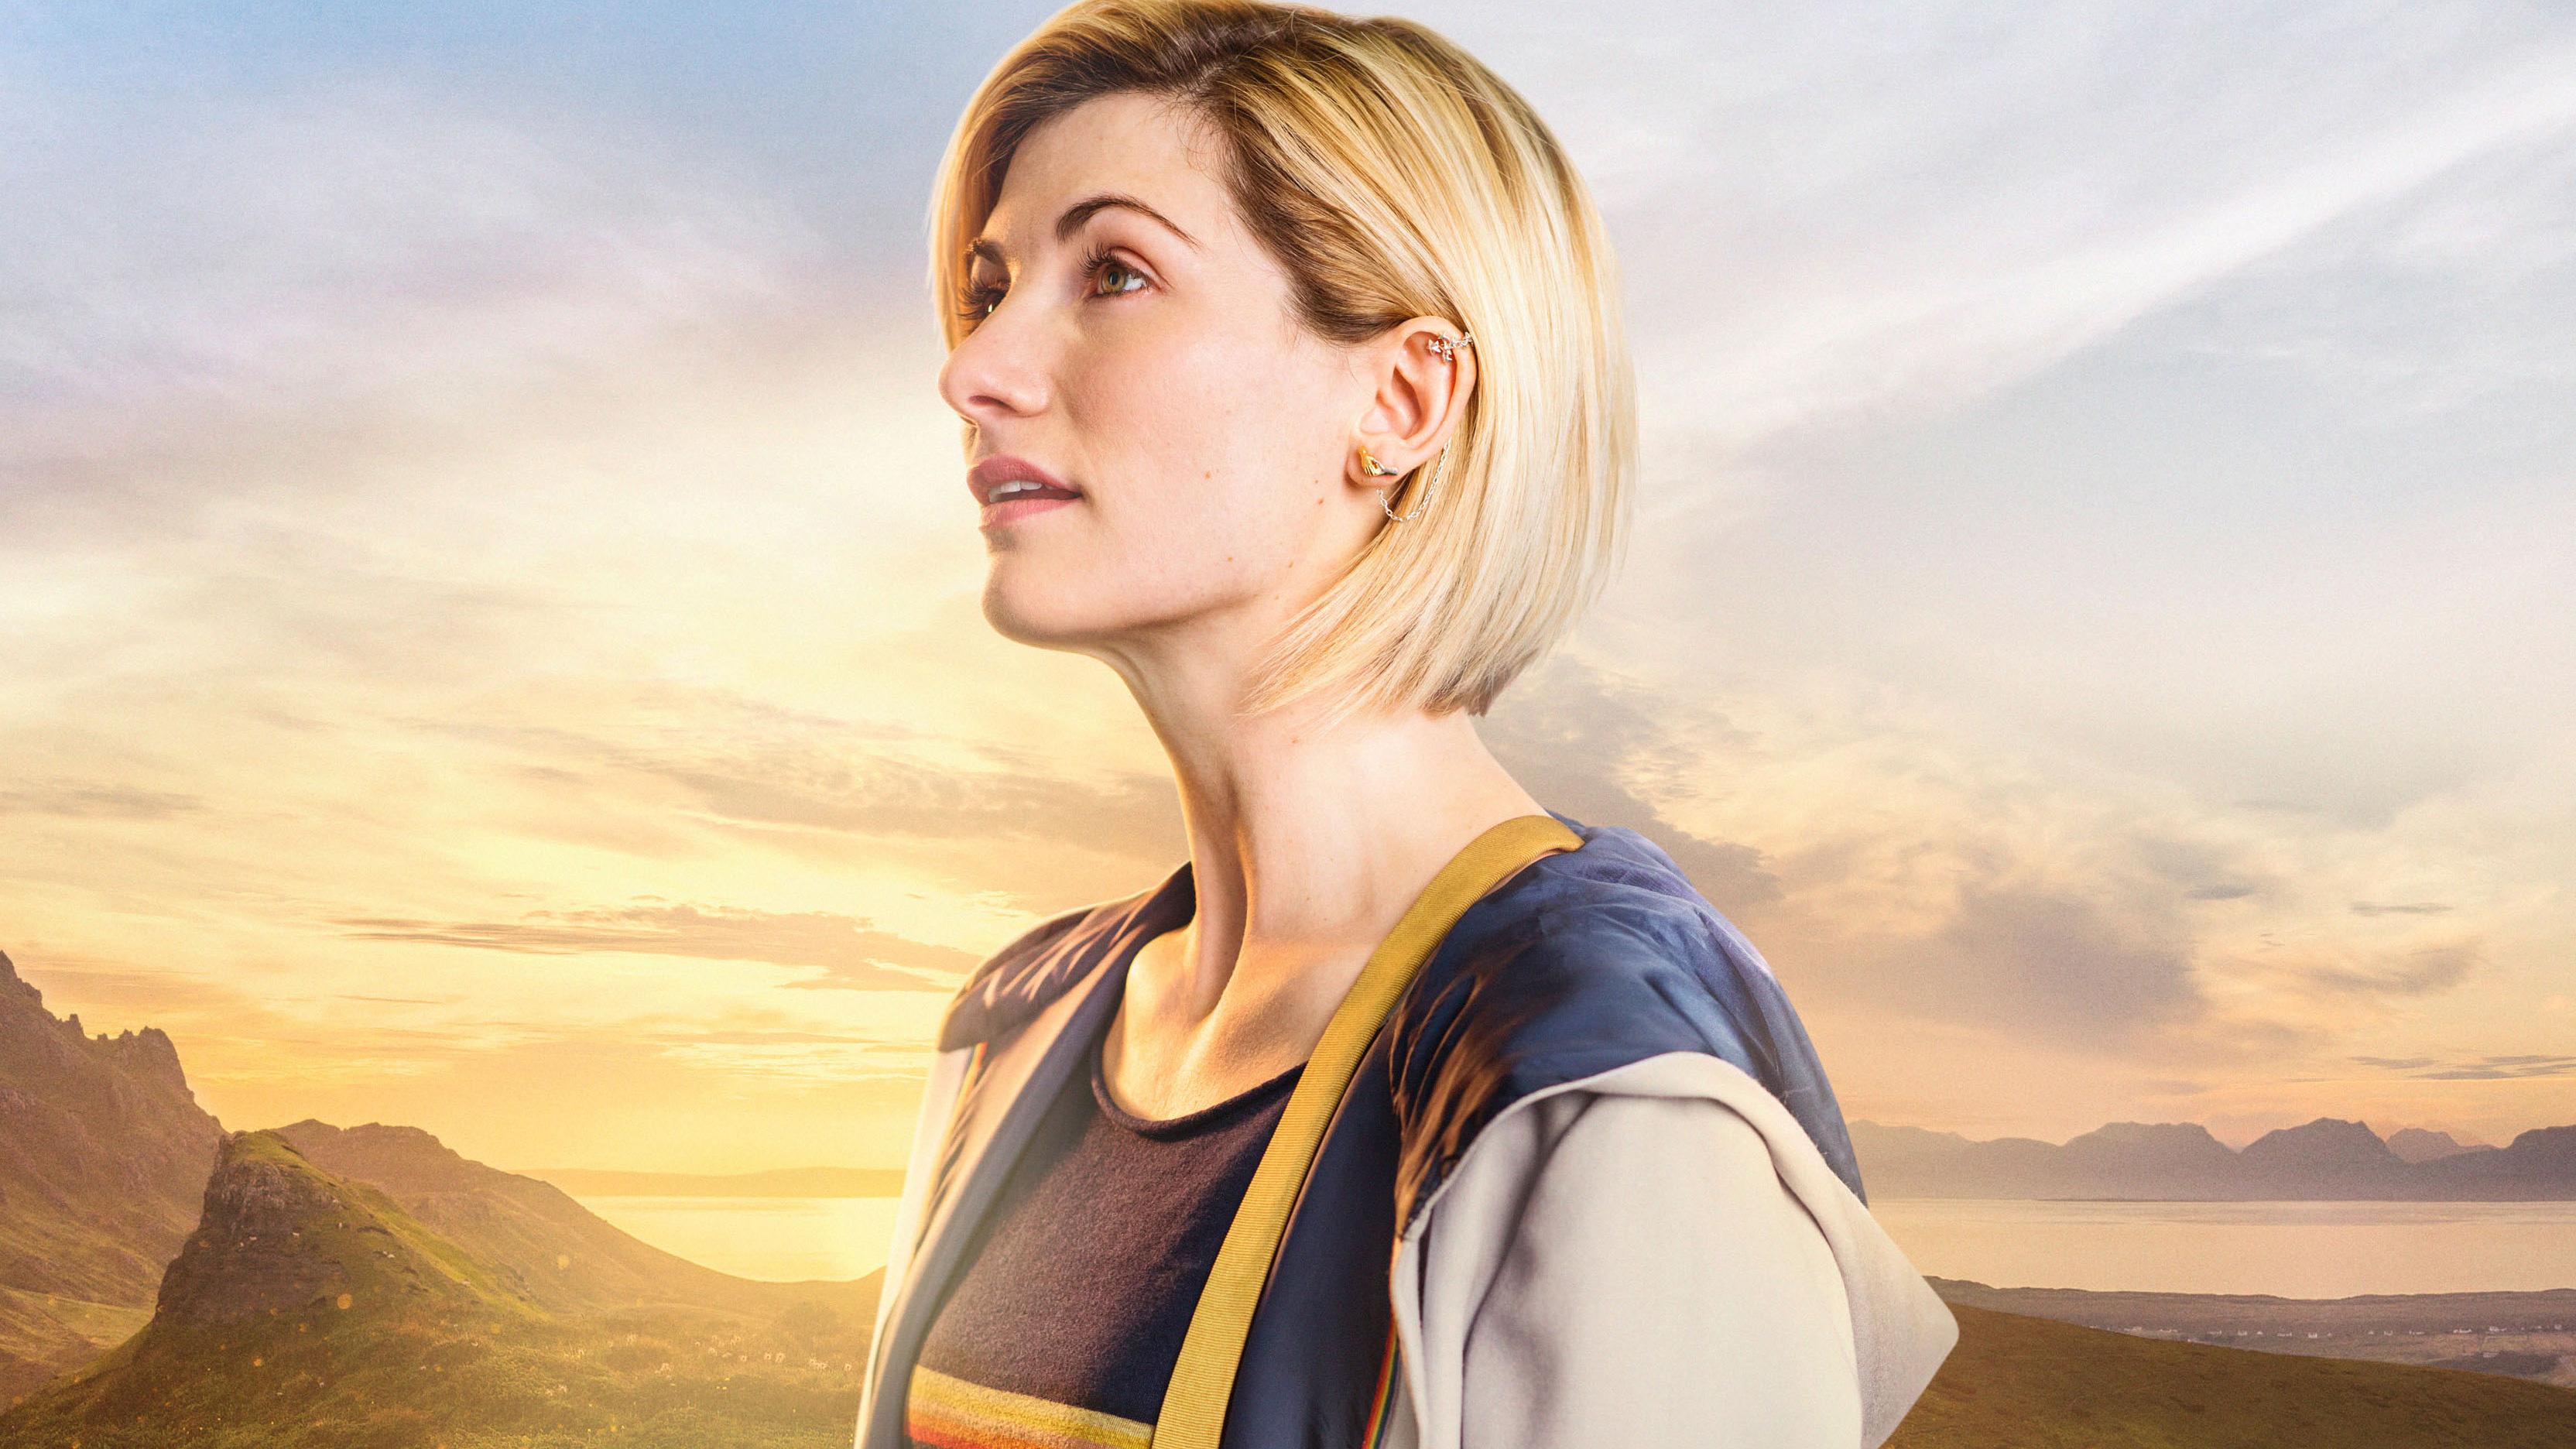 Jodie Whittaker In Doctor Who Season 11 Wallpapers Hd Wallpapers